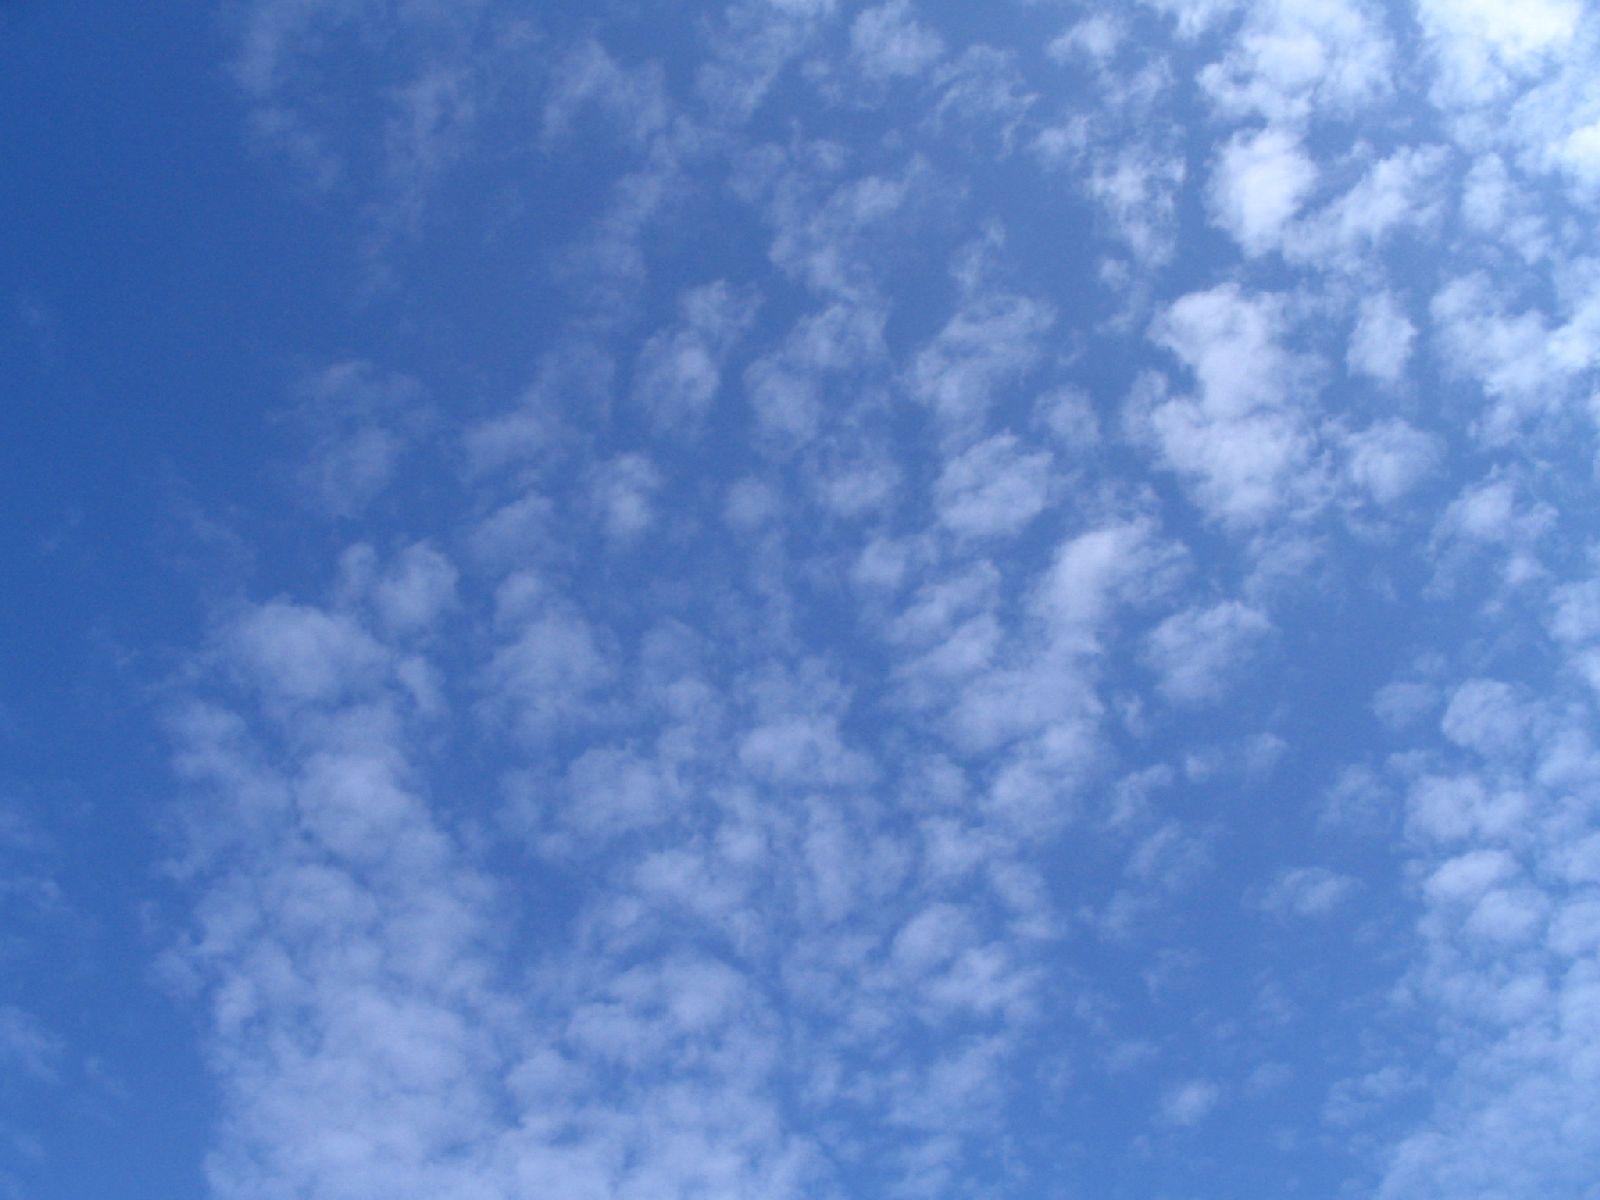 Himmel-Wolken-Foto_Textur_B_1902